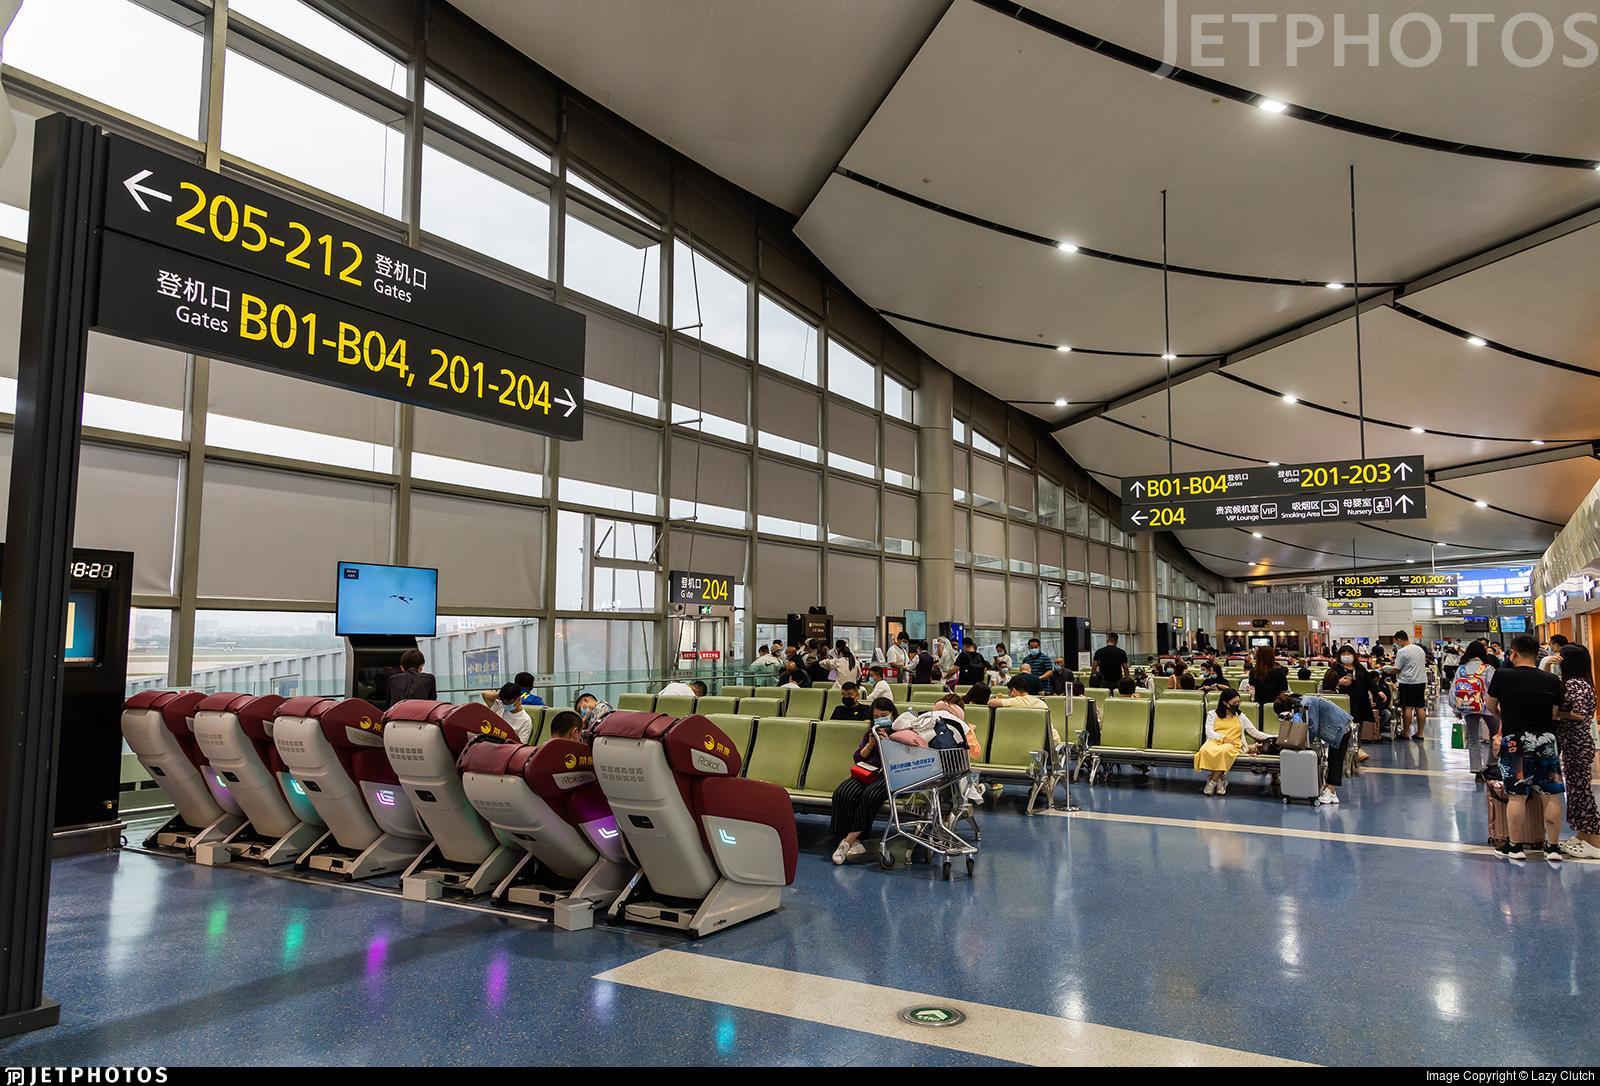 ZBYN - Airport - Terminal